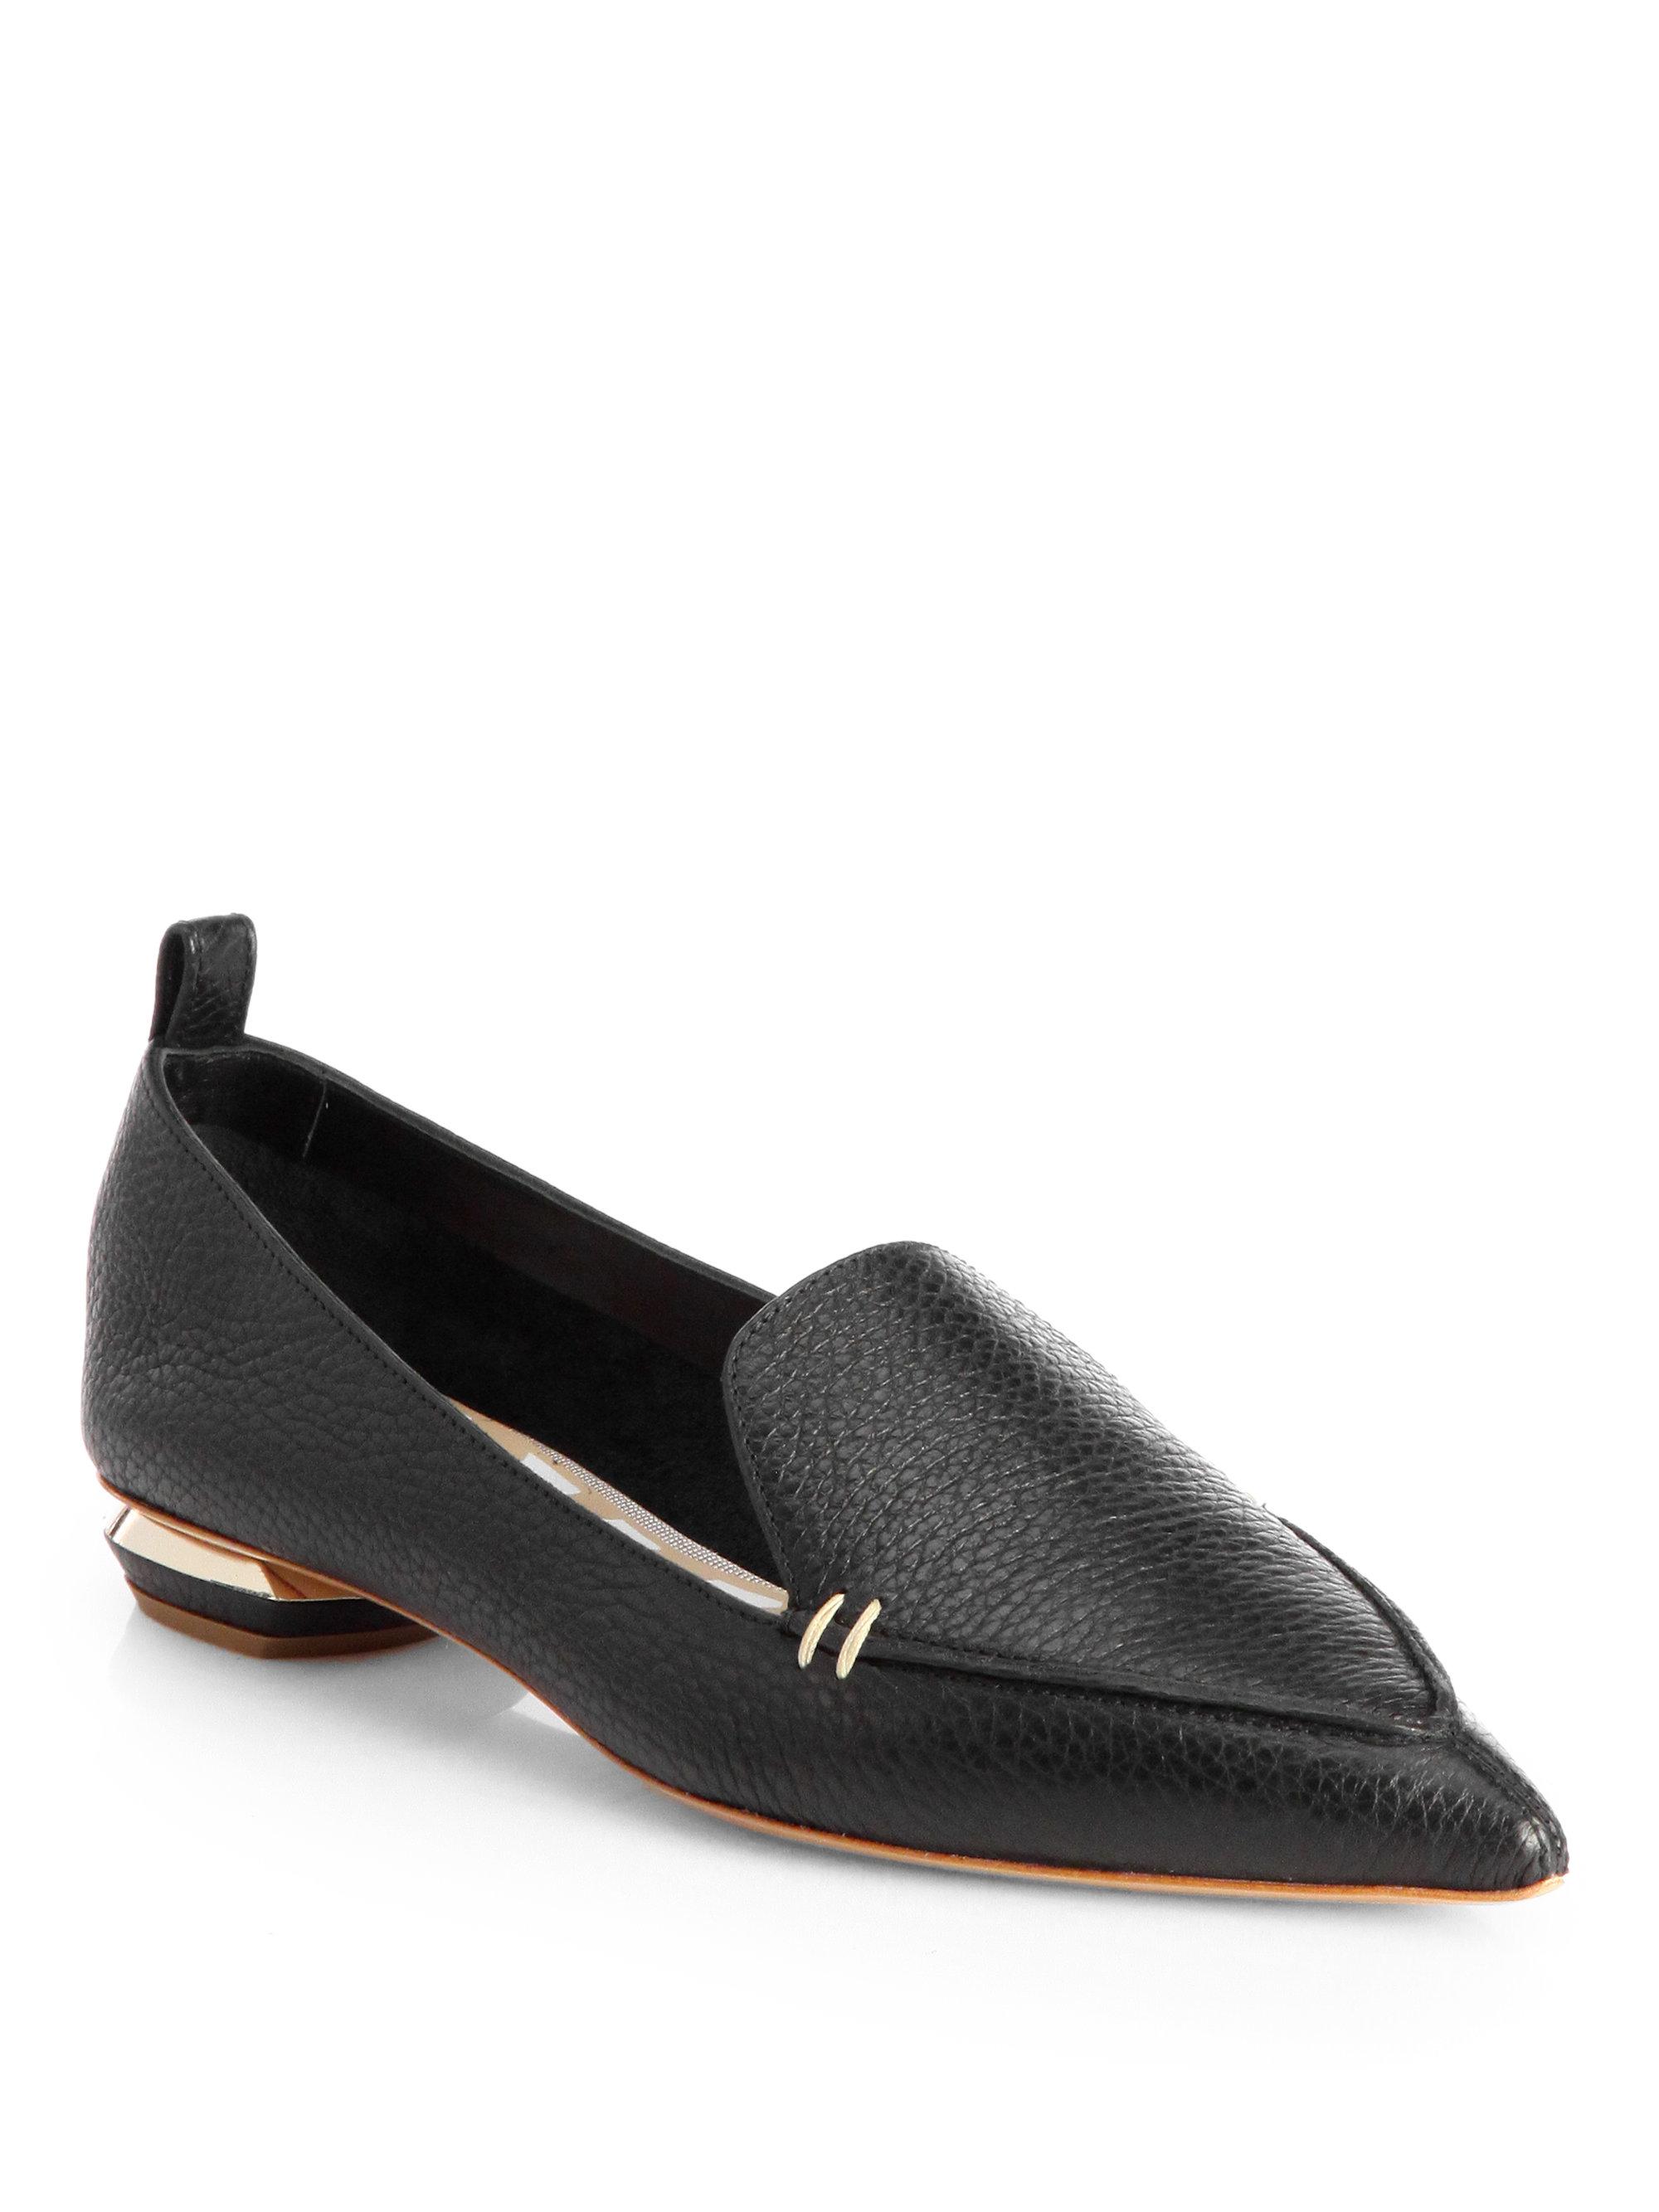 Nicholas Kirkwood Mens Shoes